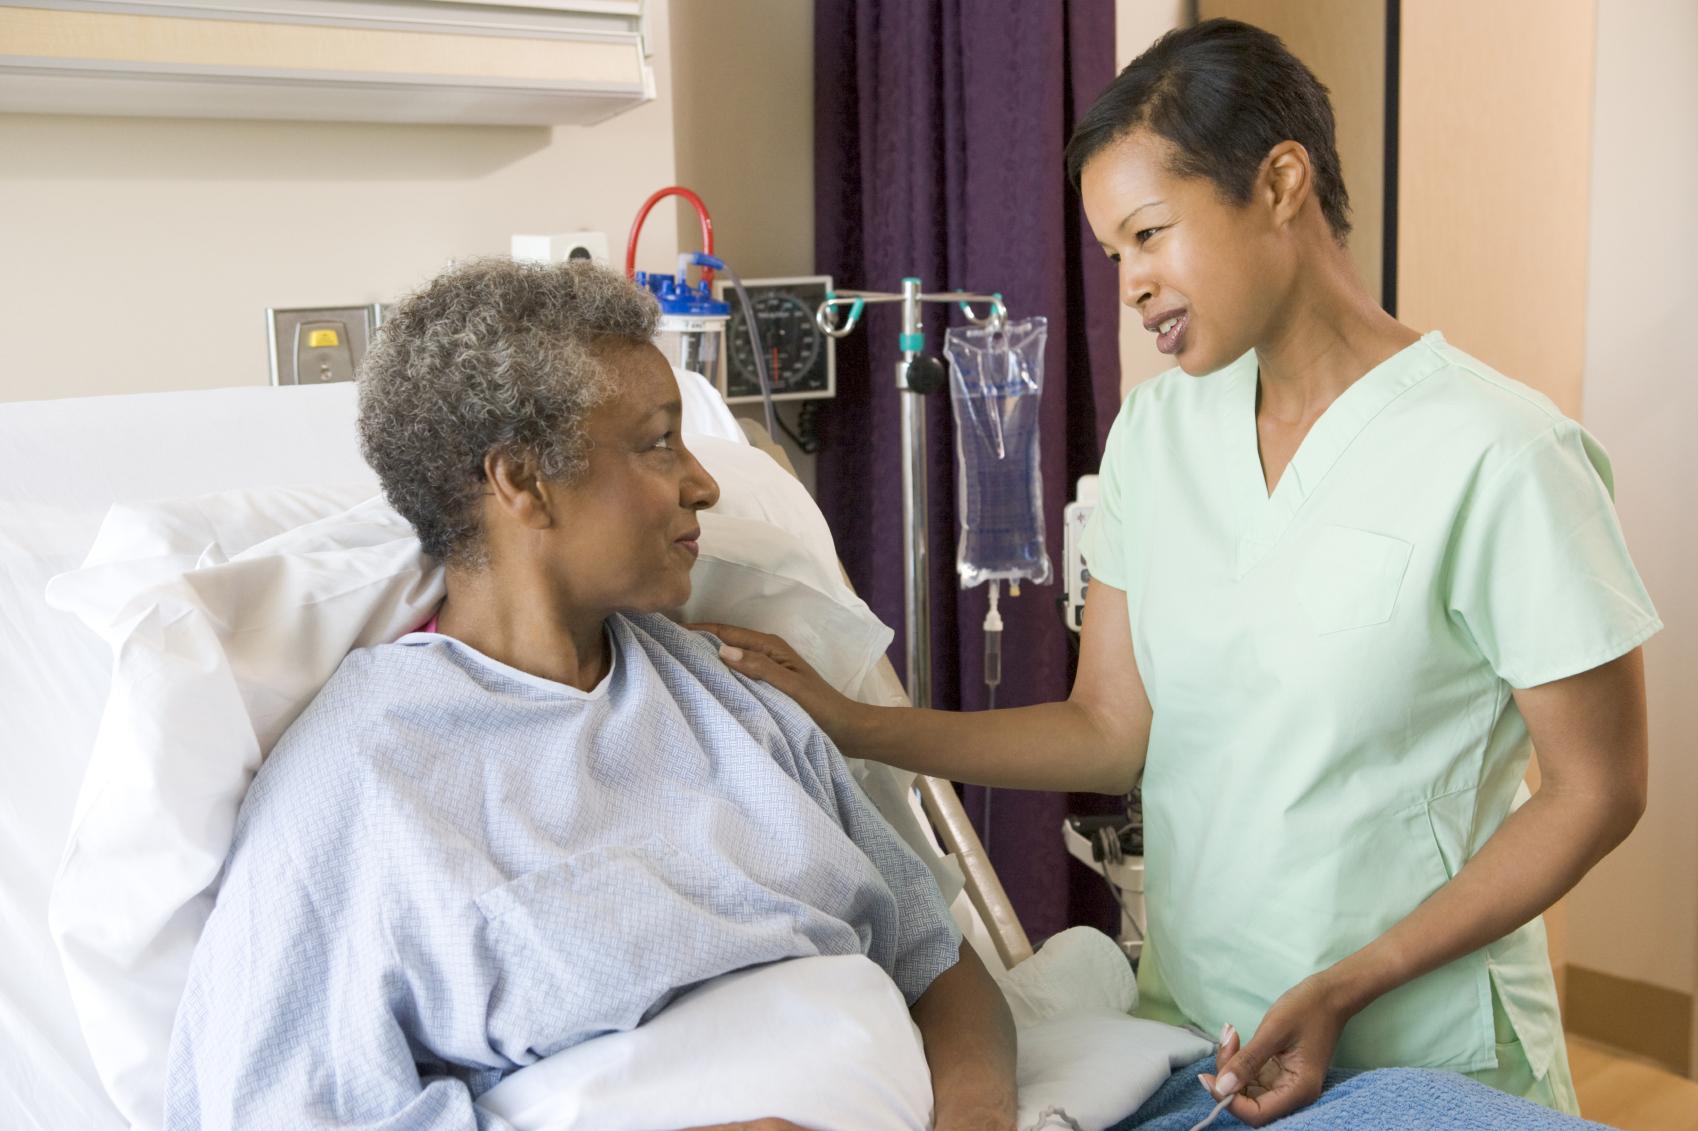 Long Term Care (LTC) at Deerbrook Skilled Nursing & Rehab - nursing home in Humble, TX.